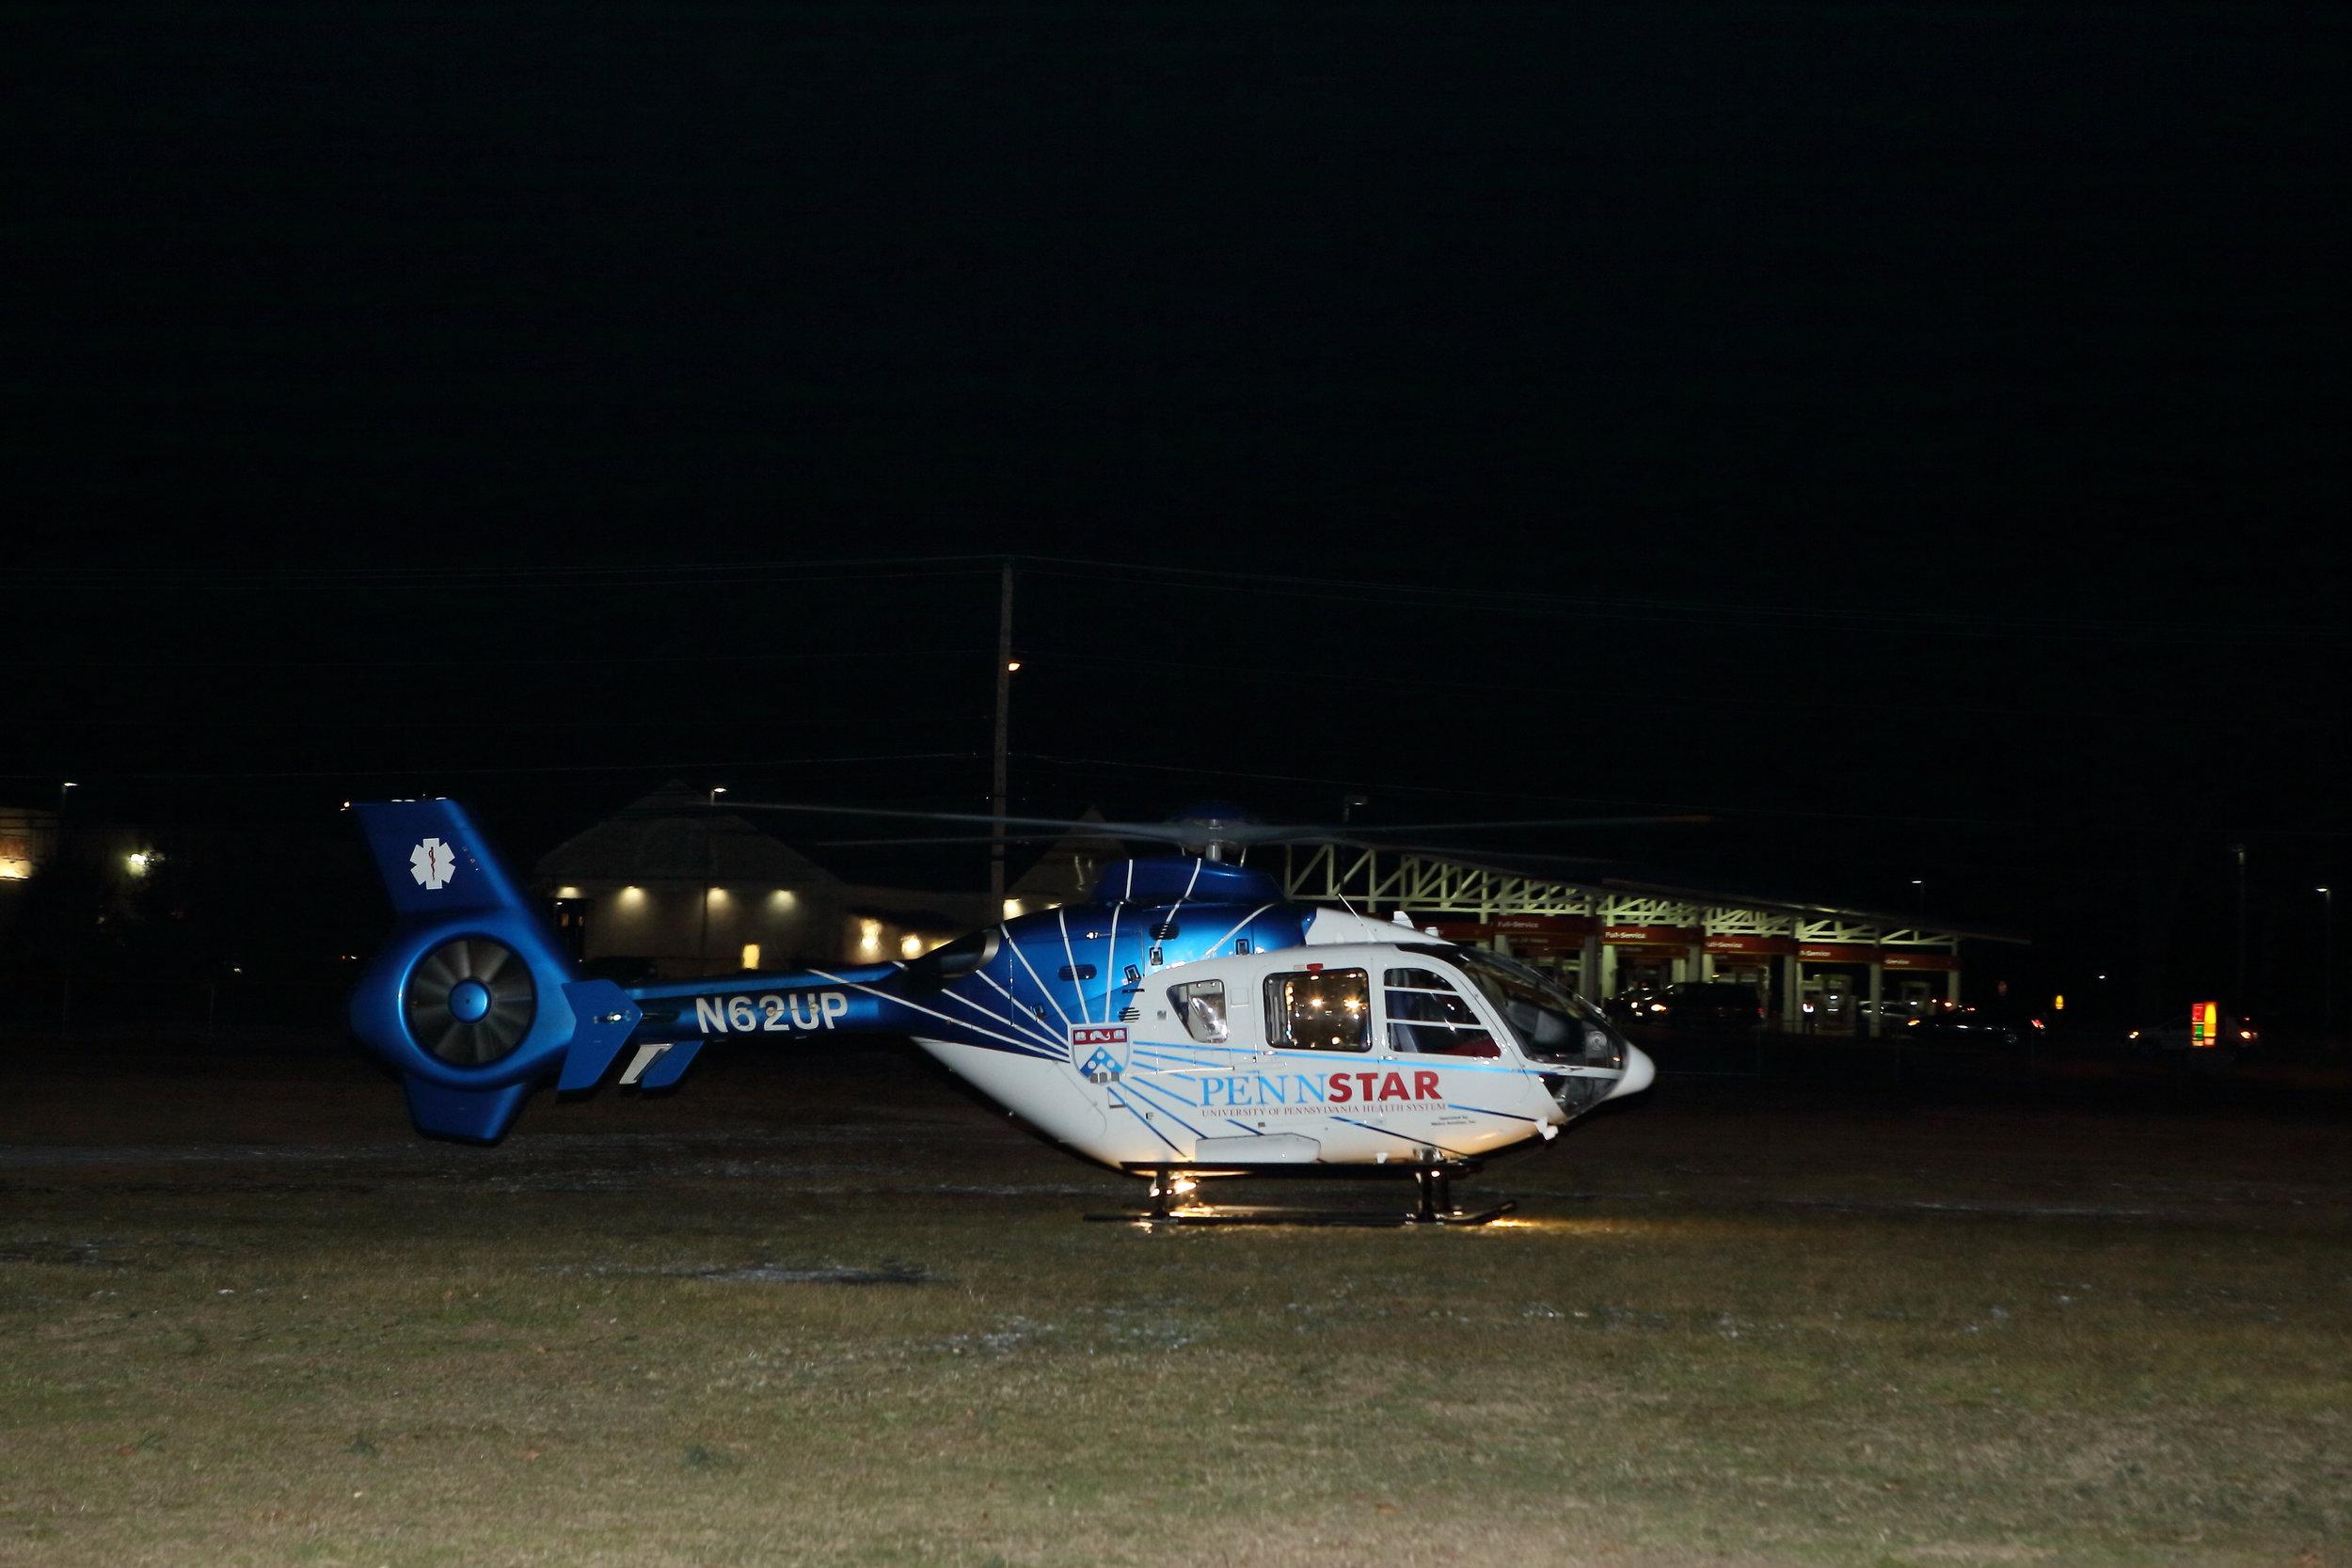 021017 Rescue-031.JPG